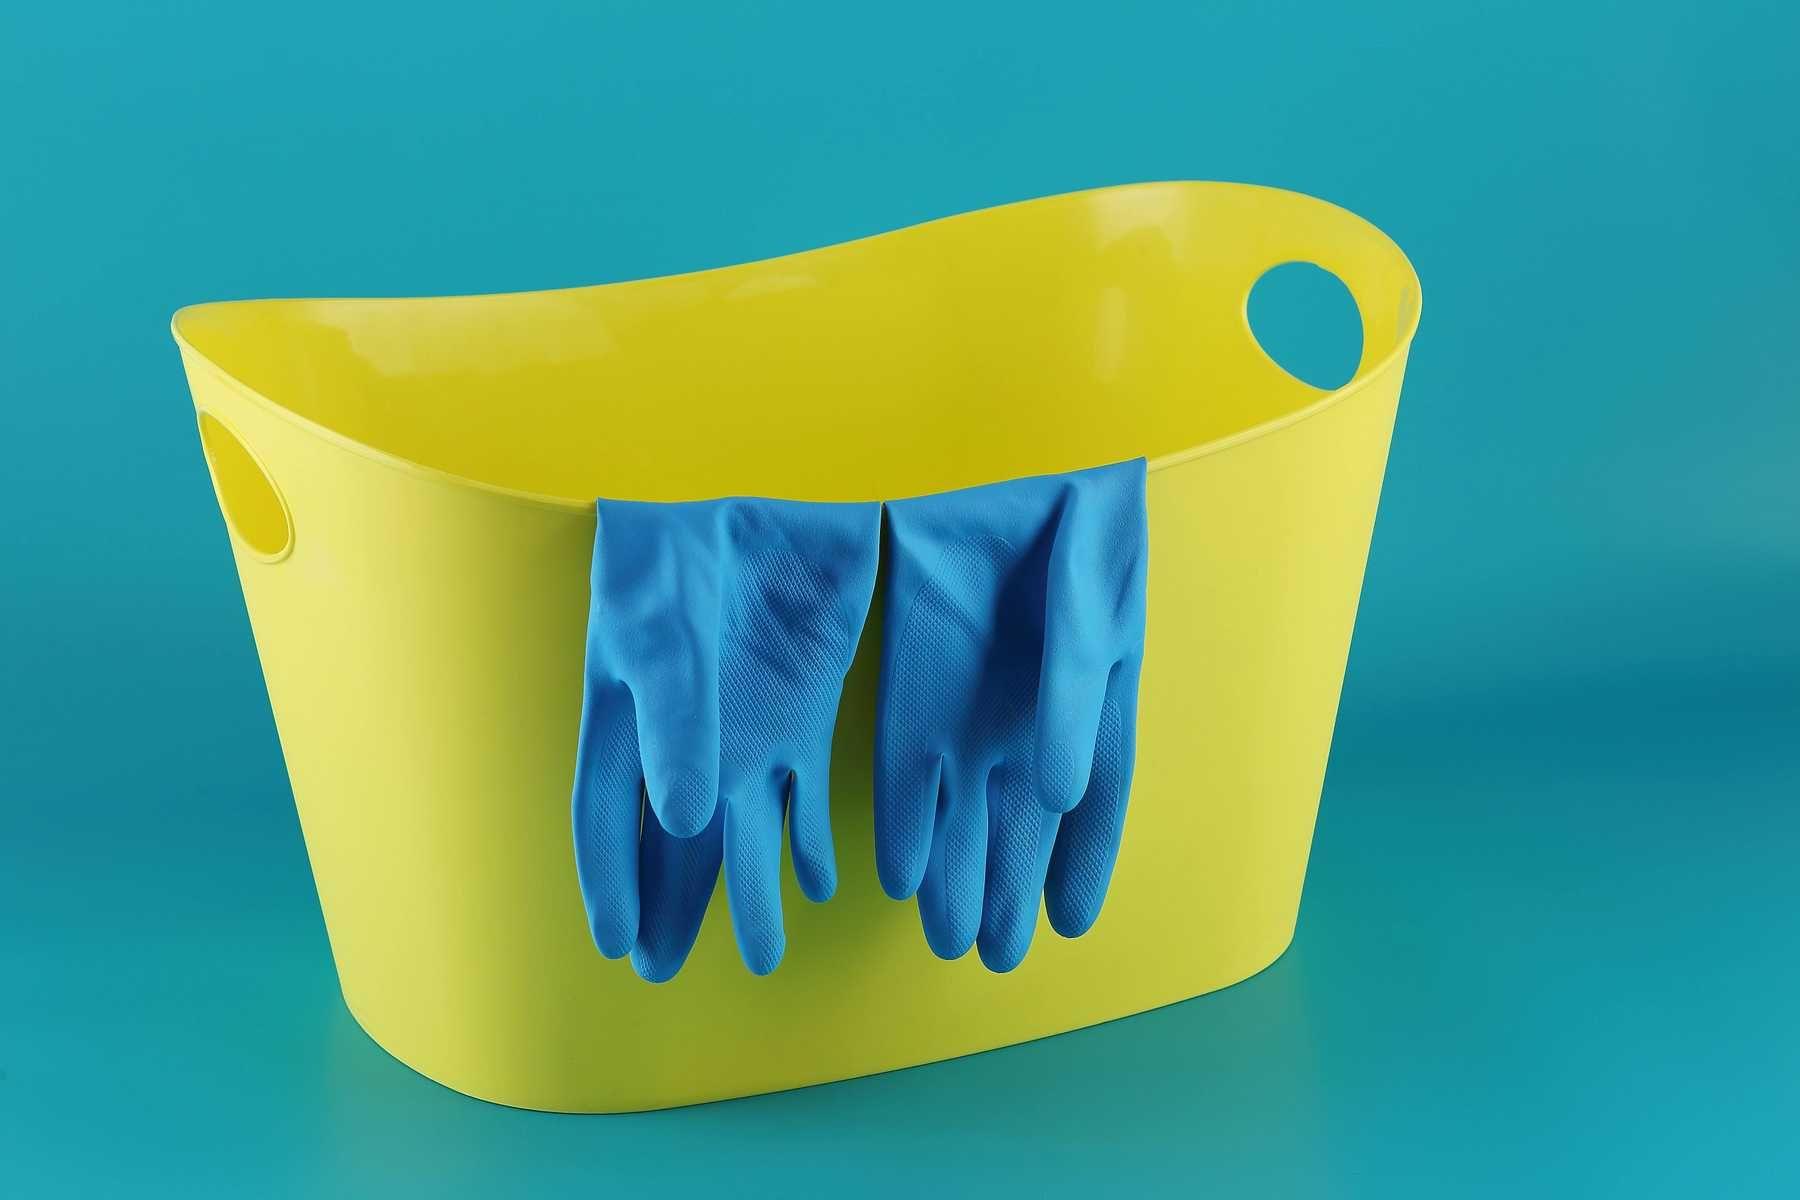 aprenda-como-fazer-a-limpeza-de-caixa-de-gordura